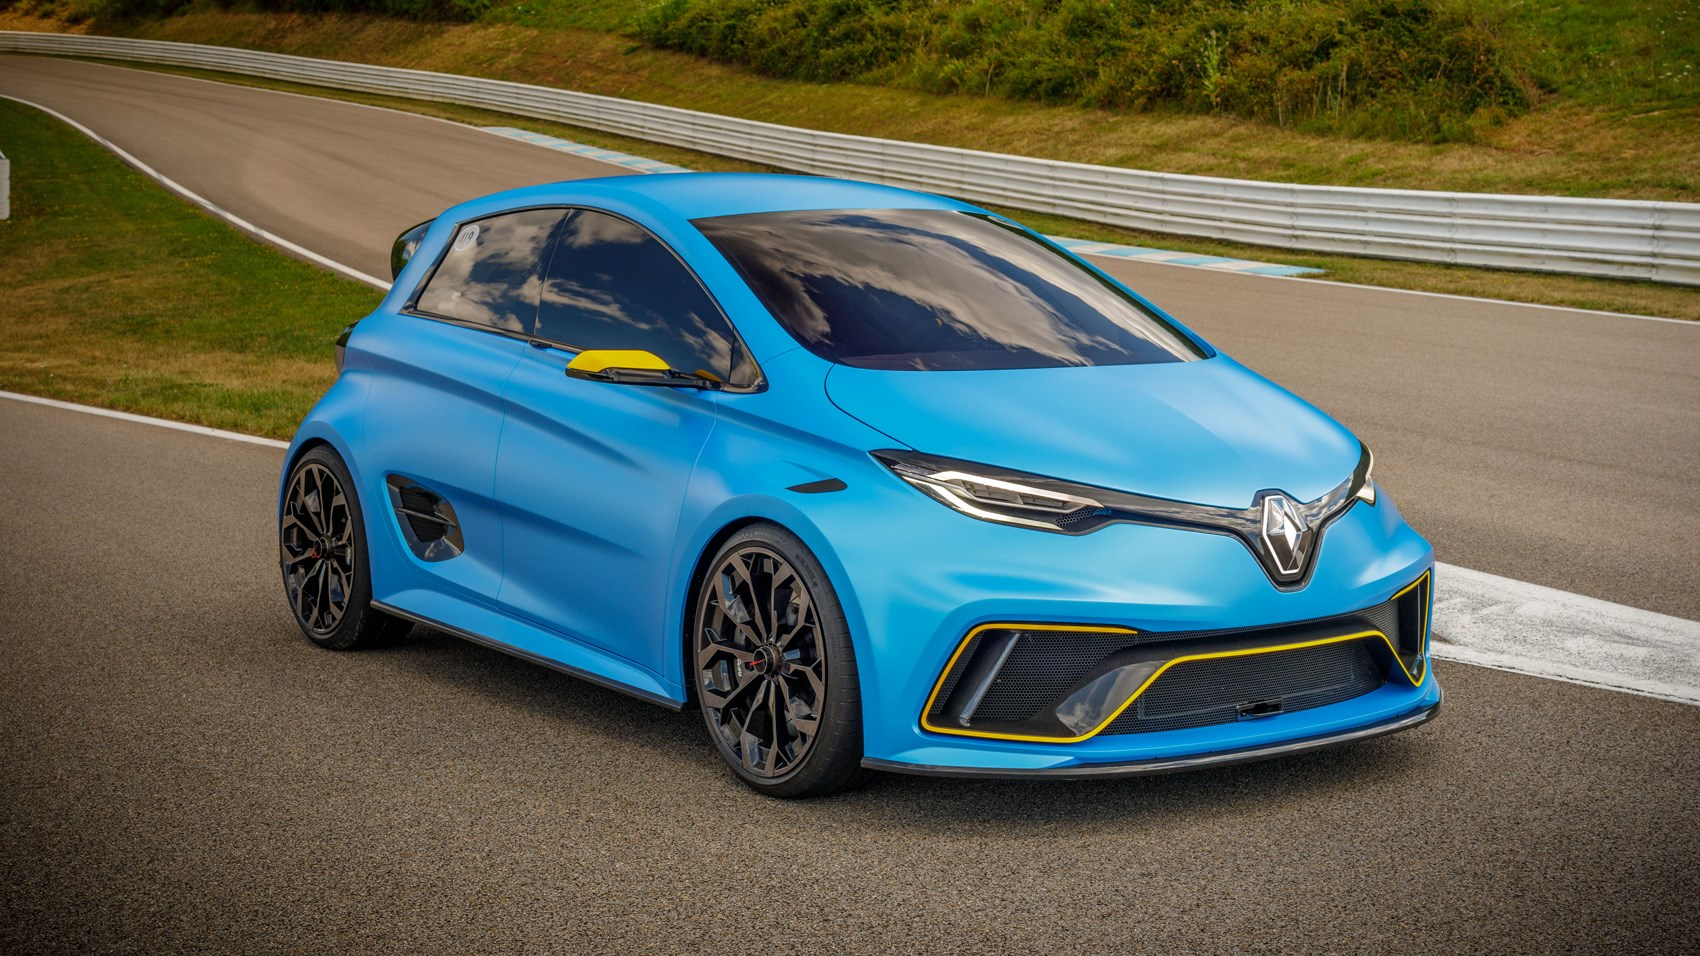 2017 - [Renault] ZOE e-Sport Concept - Page 3 Renault-zoe-esport-10